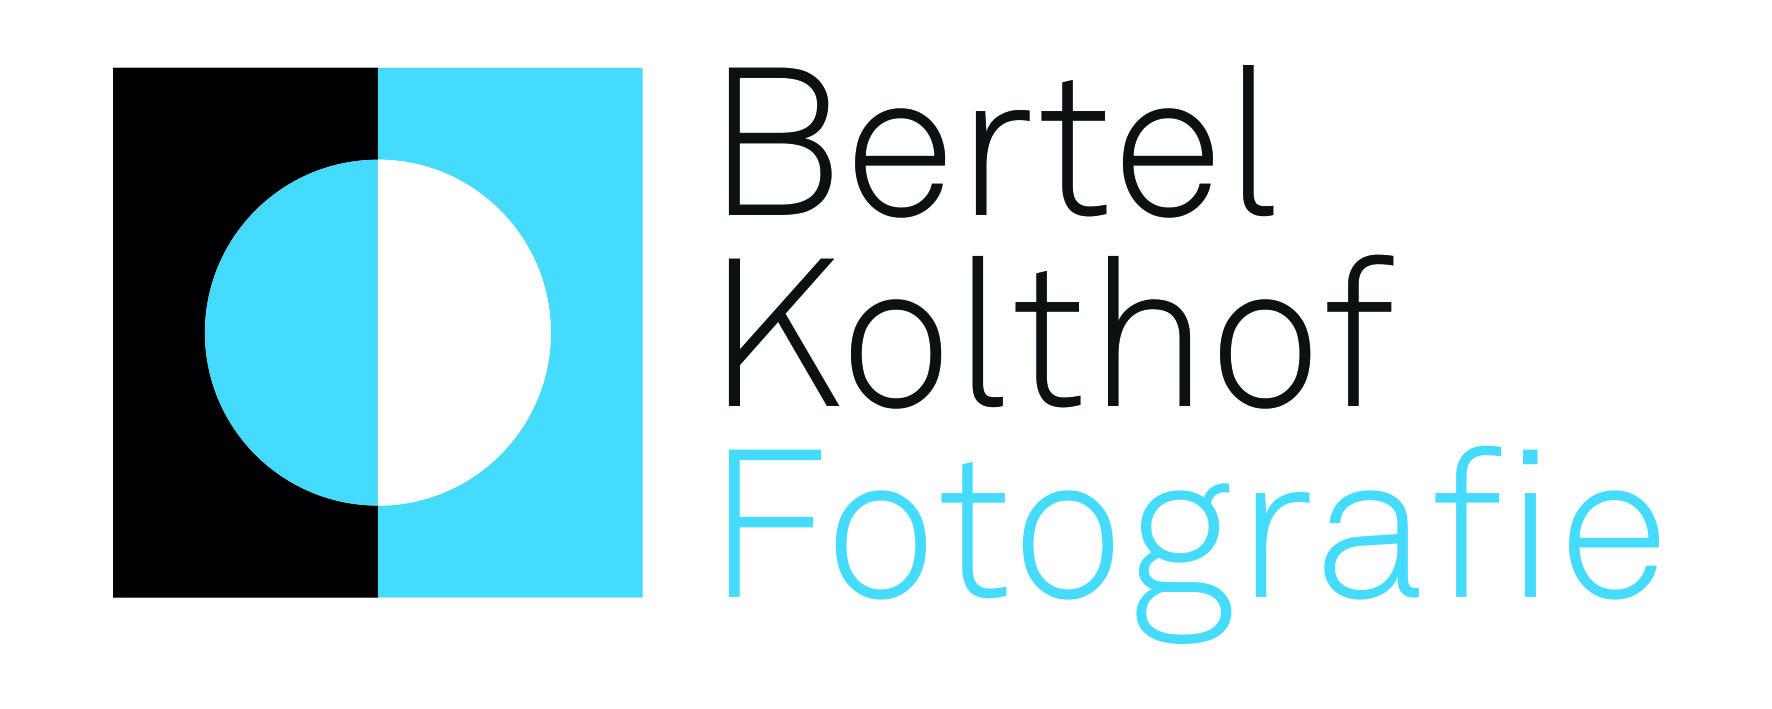 Bertel Kolthof